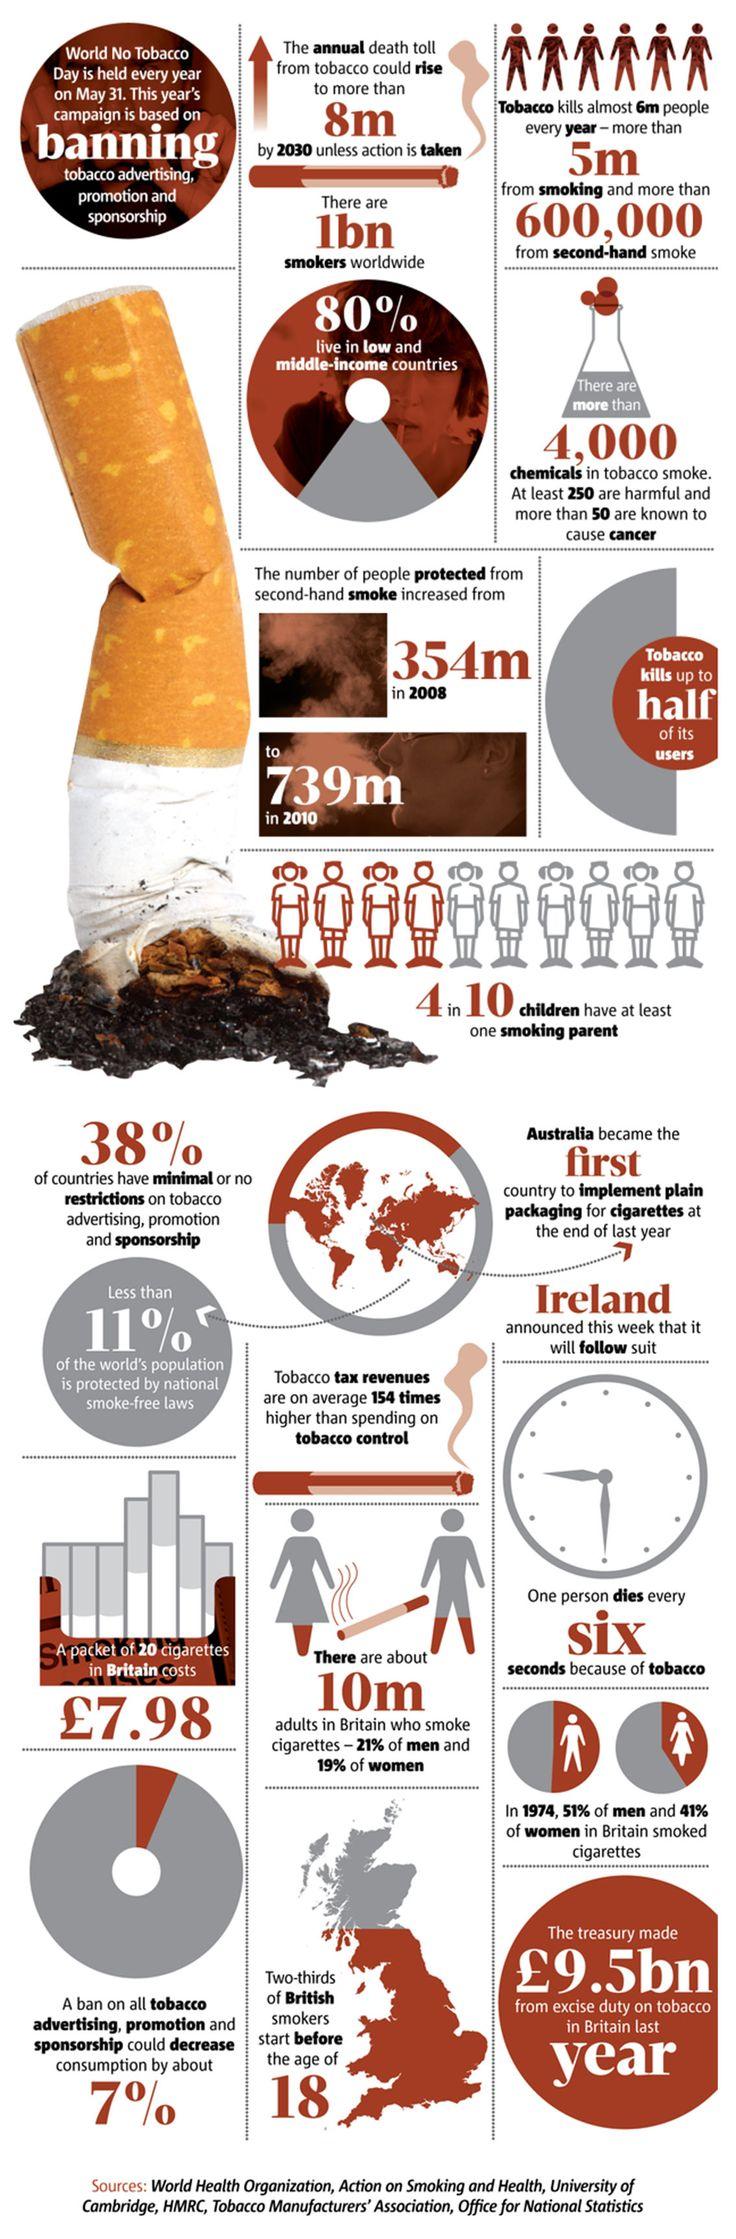 World No Tobacco Day: Smoking Statistics - Infographic. Topic: smoking, health, statistics, cigarette